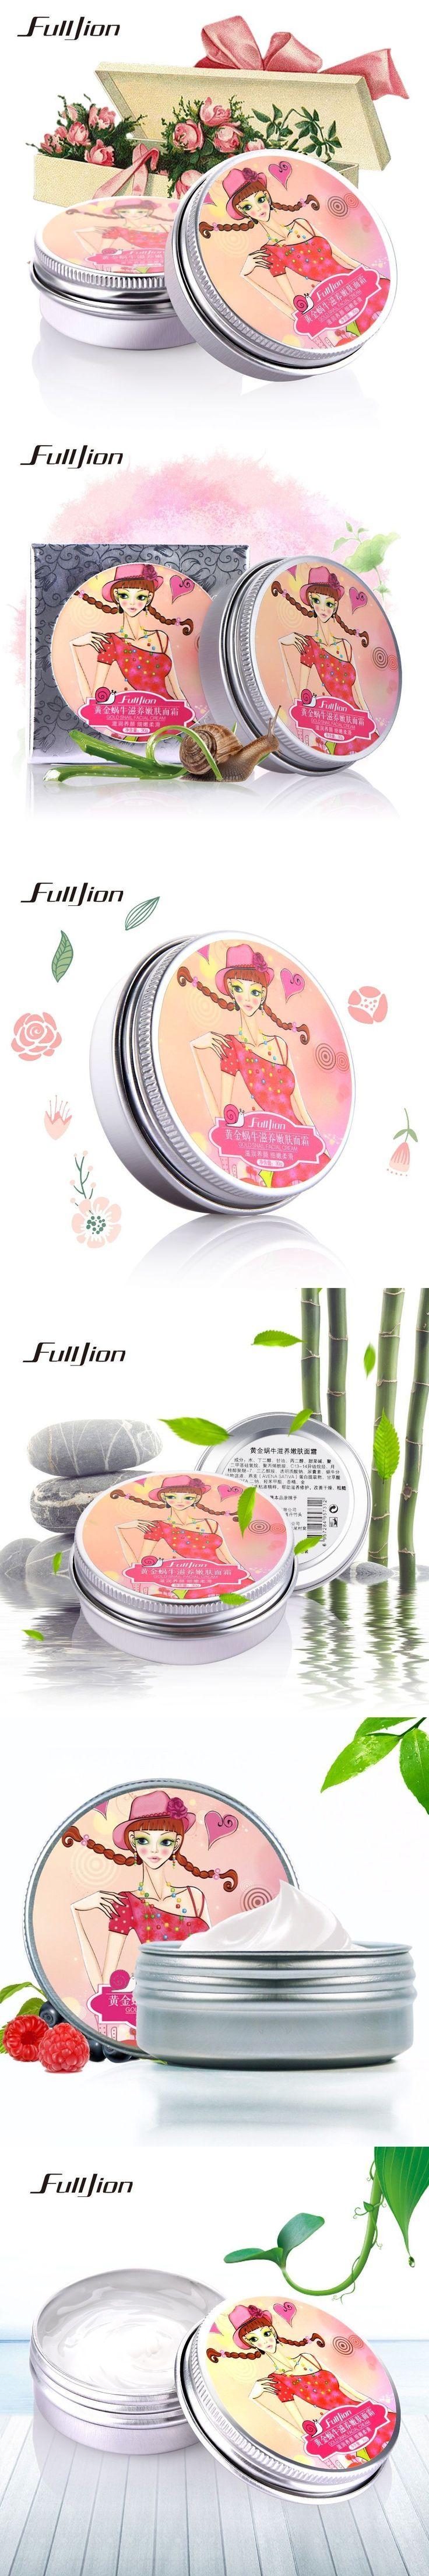 Snail Face Cream Moisturizing Anti-Aging Whitening Cream For Face Care Acne Anti Wrinkle Superfine skin care tools #facecreamsmoisturizing